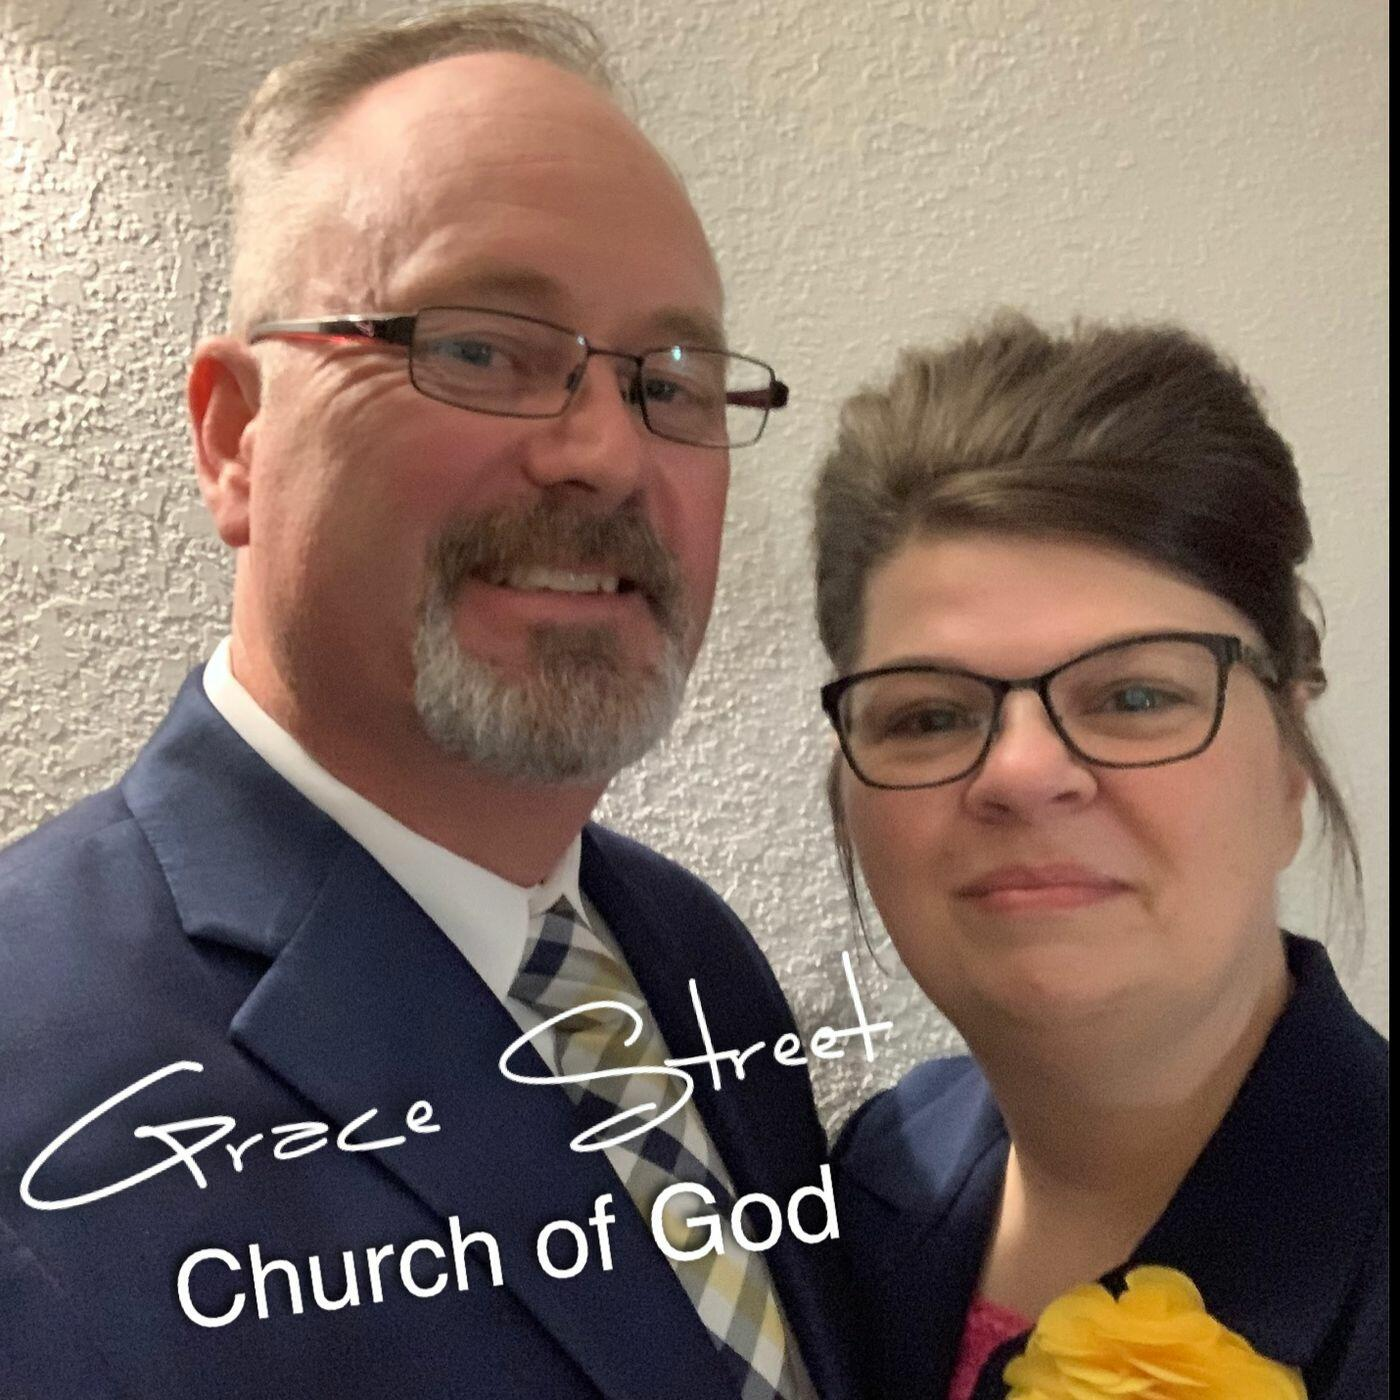 Grace Street Church Service